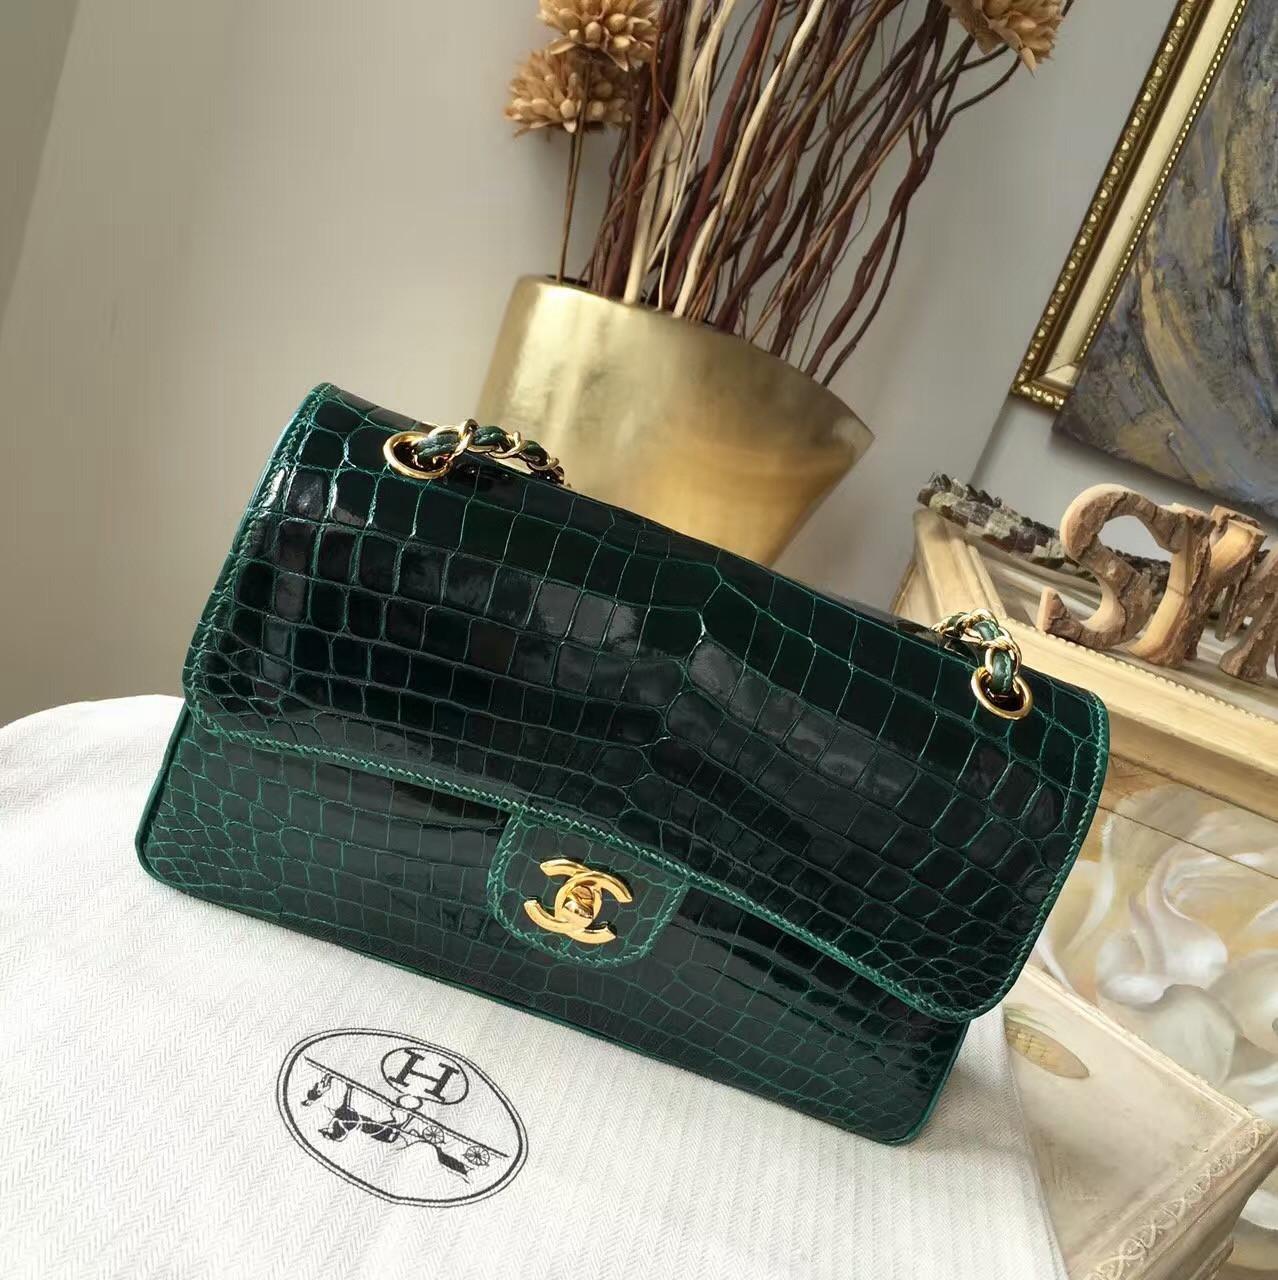 77fffae71dad57 Chanel Alligator Skin Classic Flap 25cm Bag Gold Hardware Spring/Summer 2018  Collection, Emerald